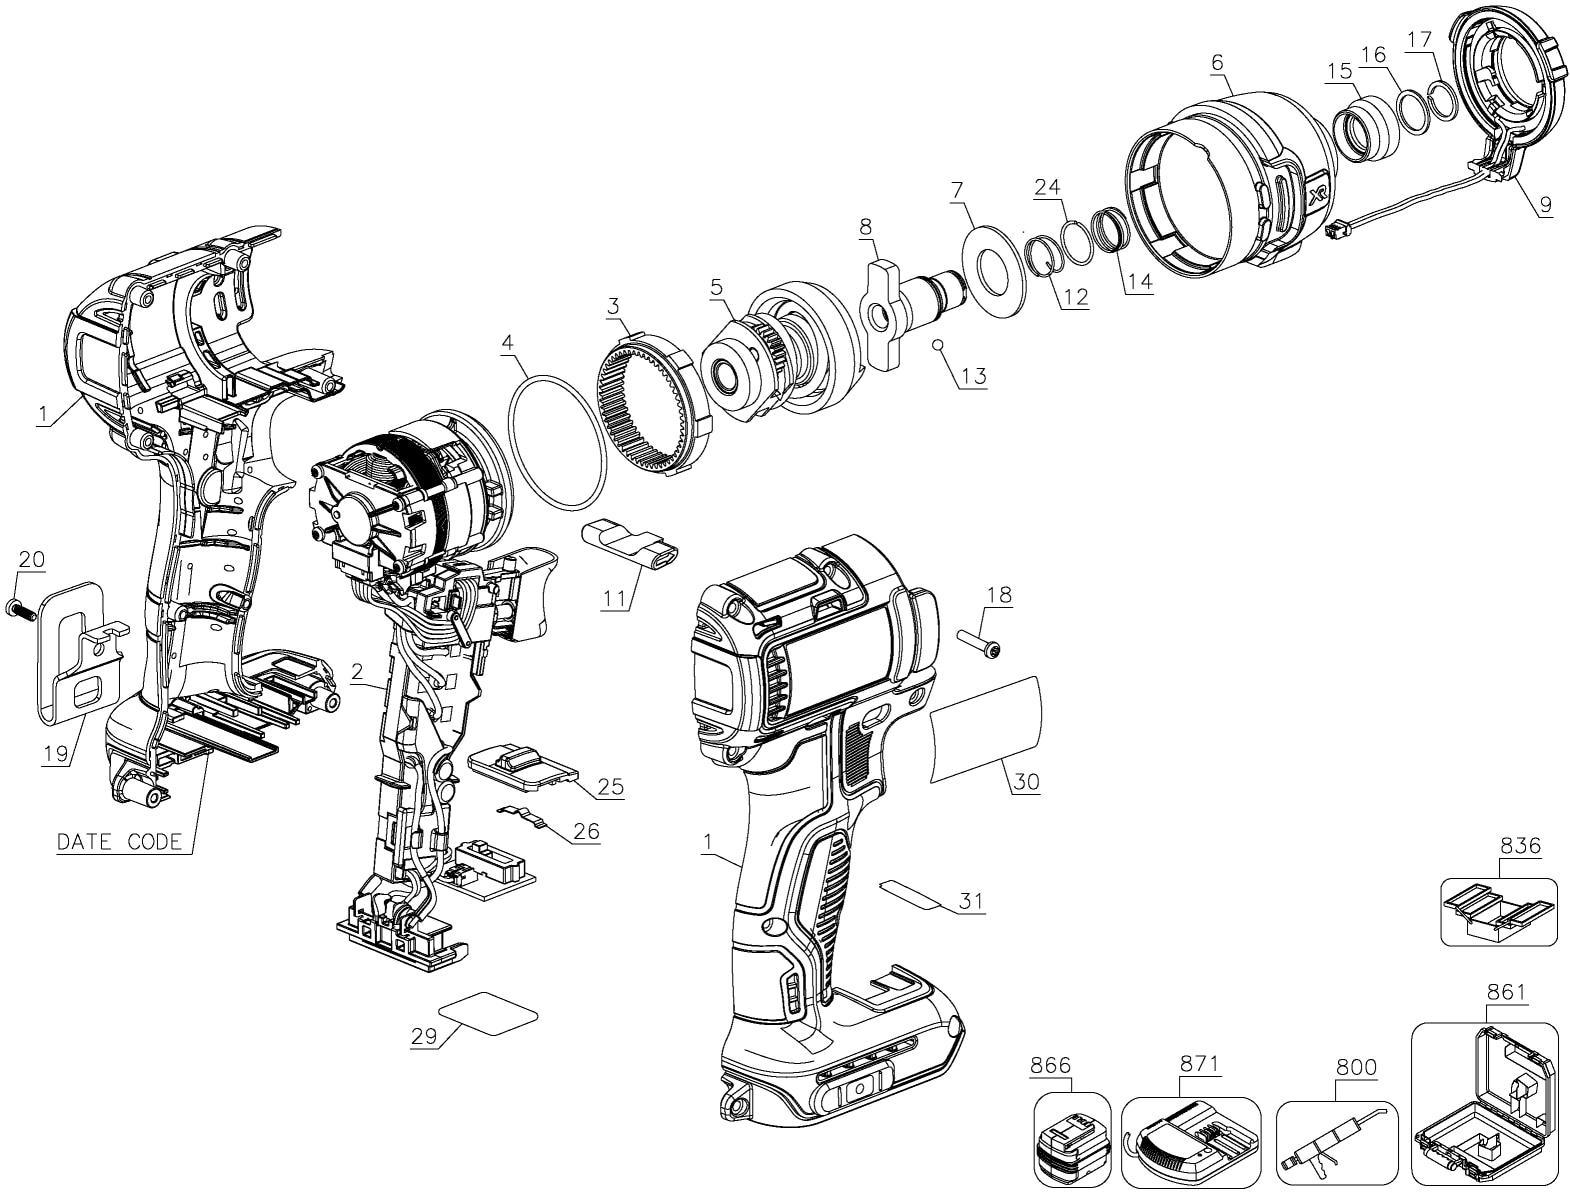 dewalt dcf887b impact driver parts